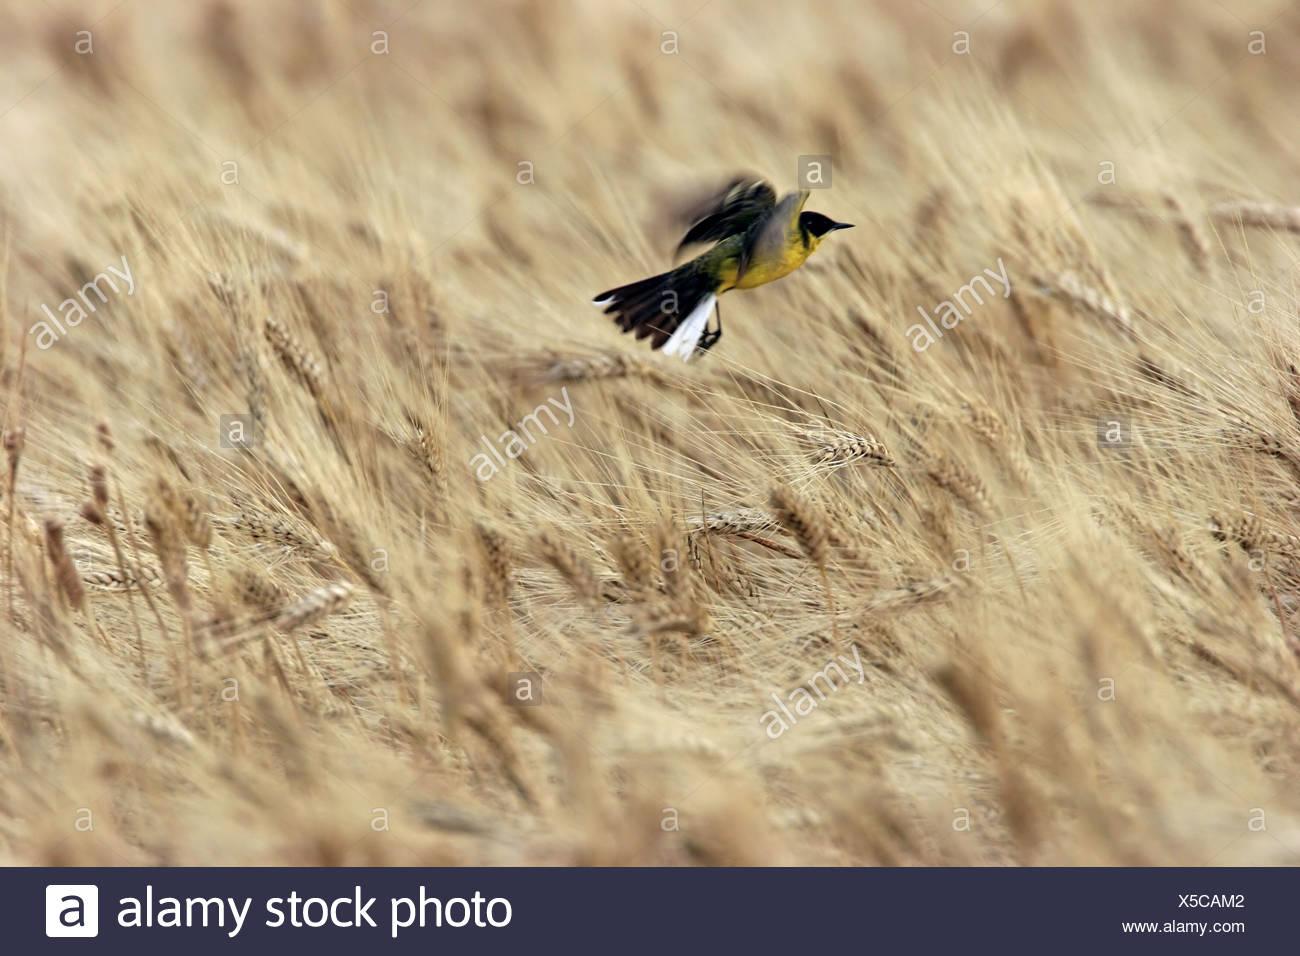 Ashy-headed Wagtail, Yellow wagtail (Motacilla flava cinereocapilla), flying over grain field, Italy, Apulia, Pulia - Stock Image